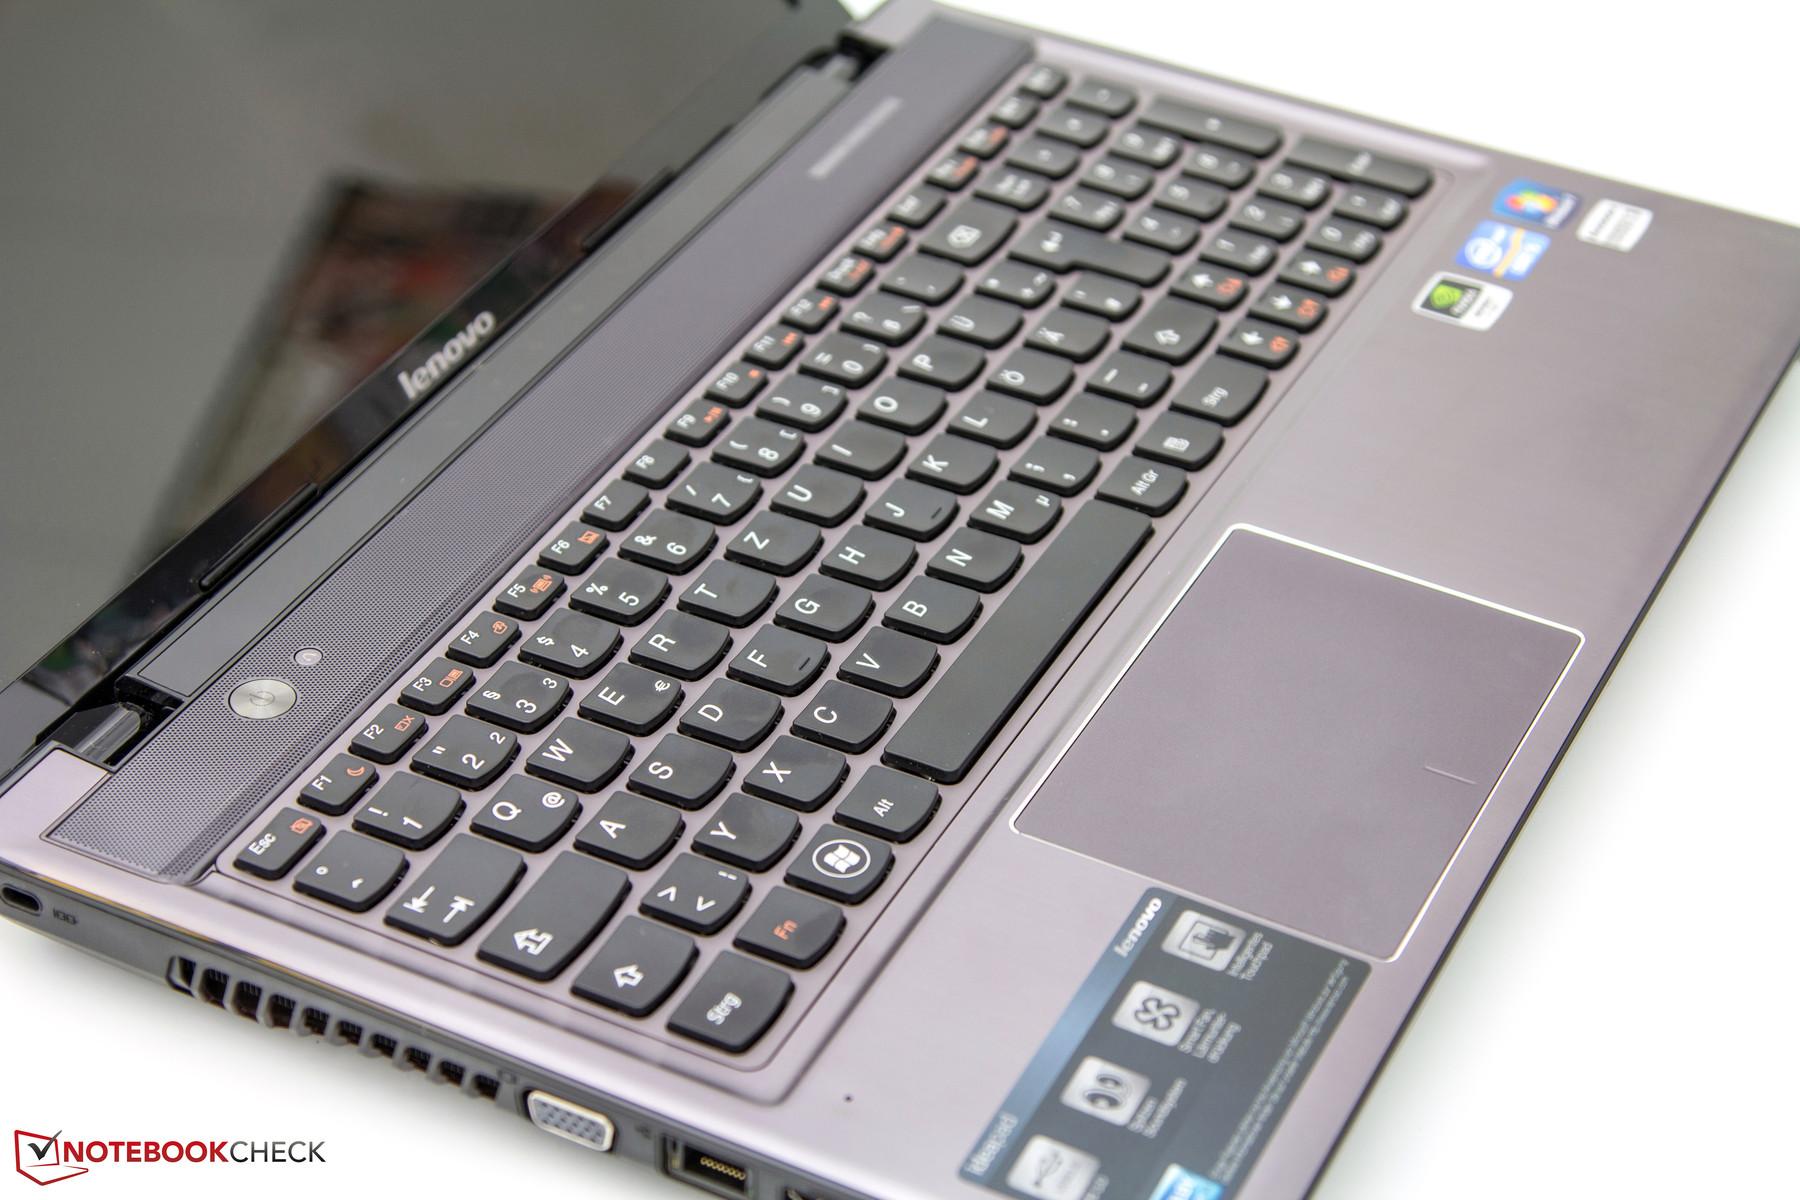 Review Lenovo Ideapad Z580 Notebook Notebookcheck Net Reviews